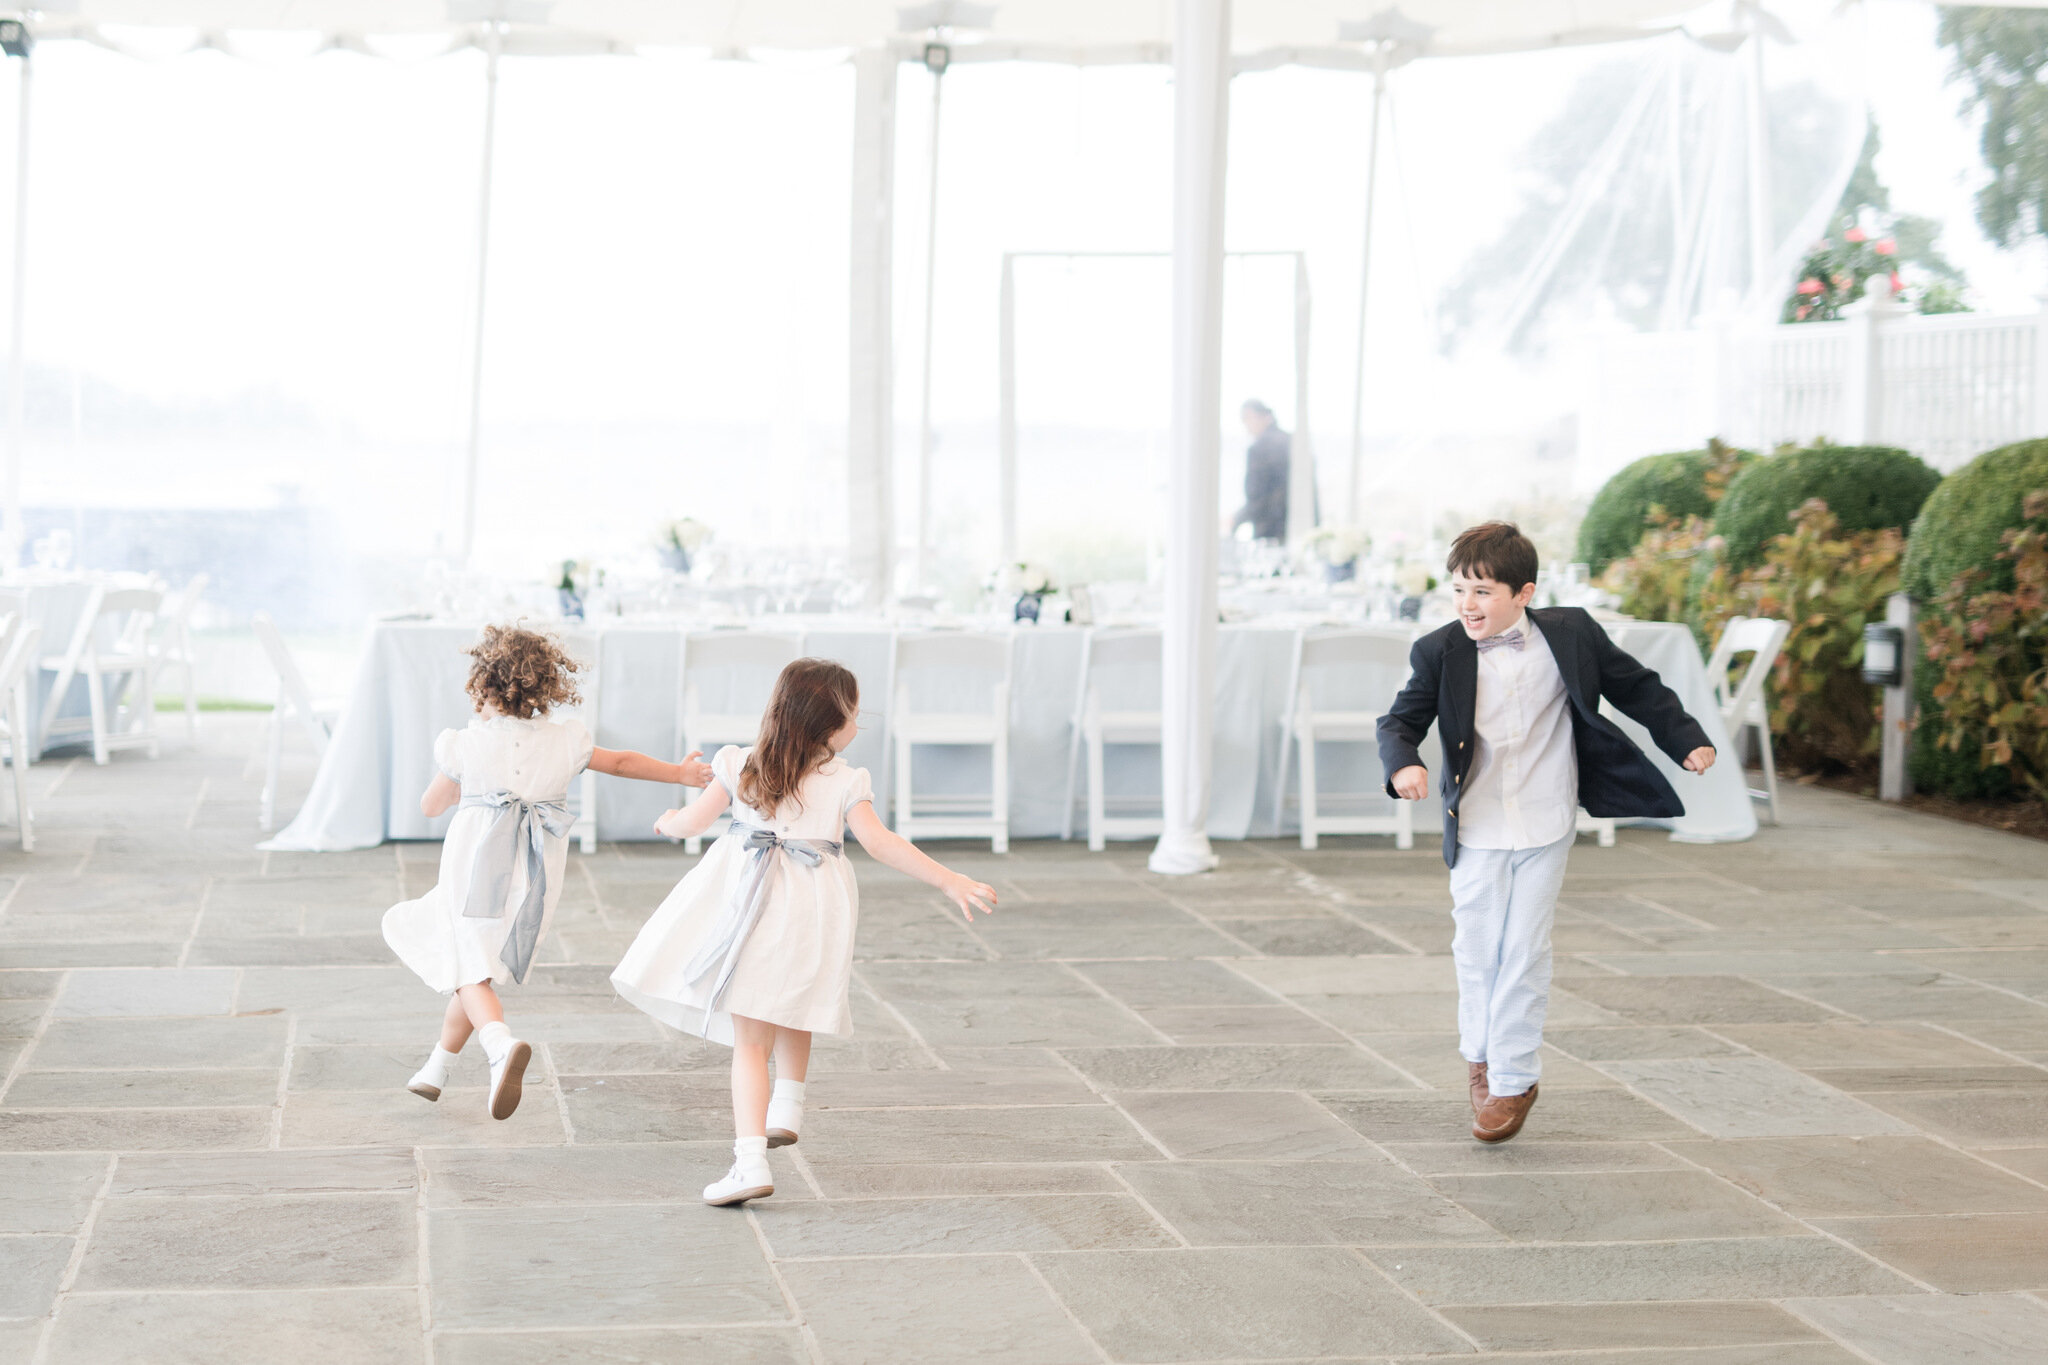 greenwich wedding_belle haven club wedding _ct wedding photographer-36_Easy-Resize.com.jpg